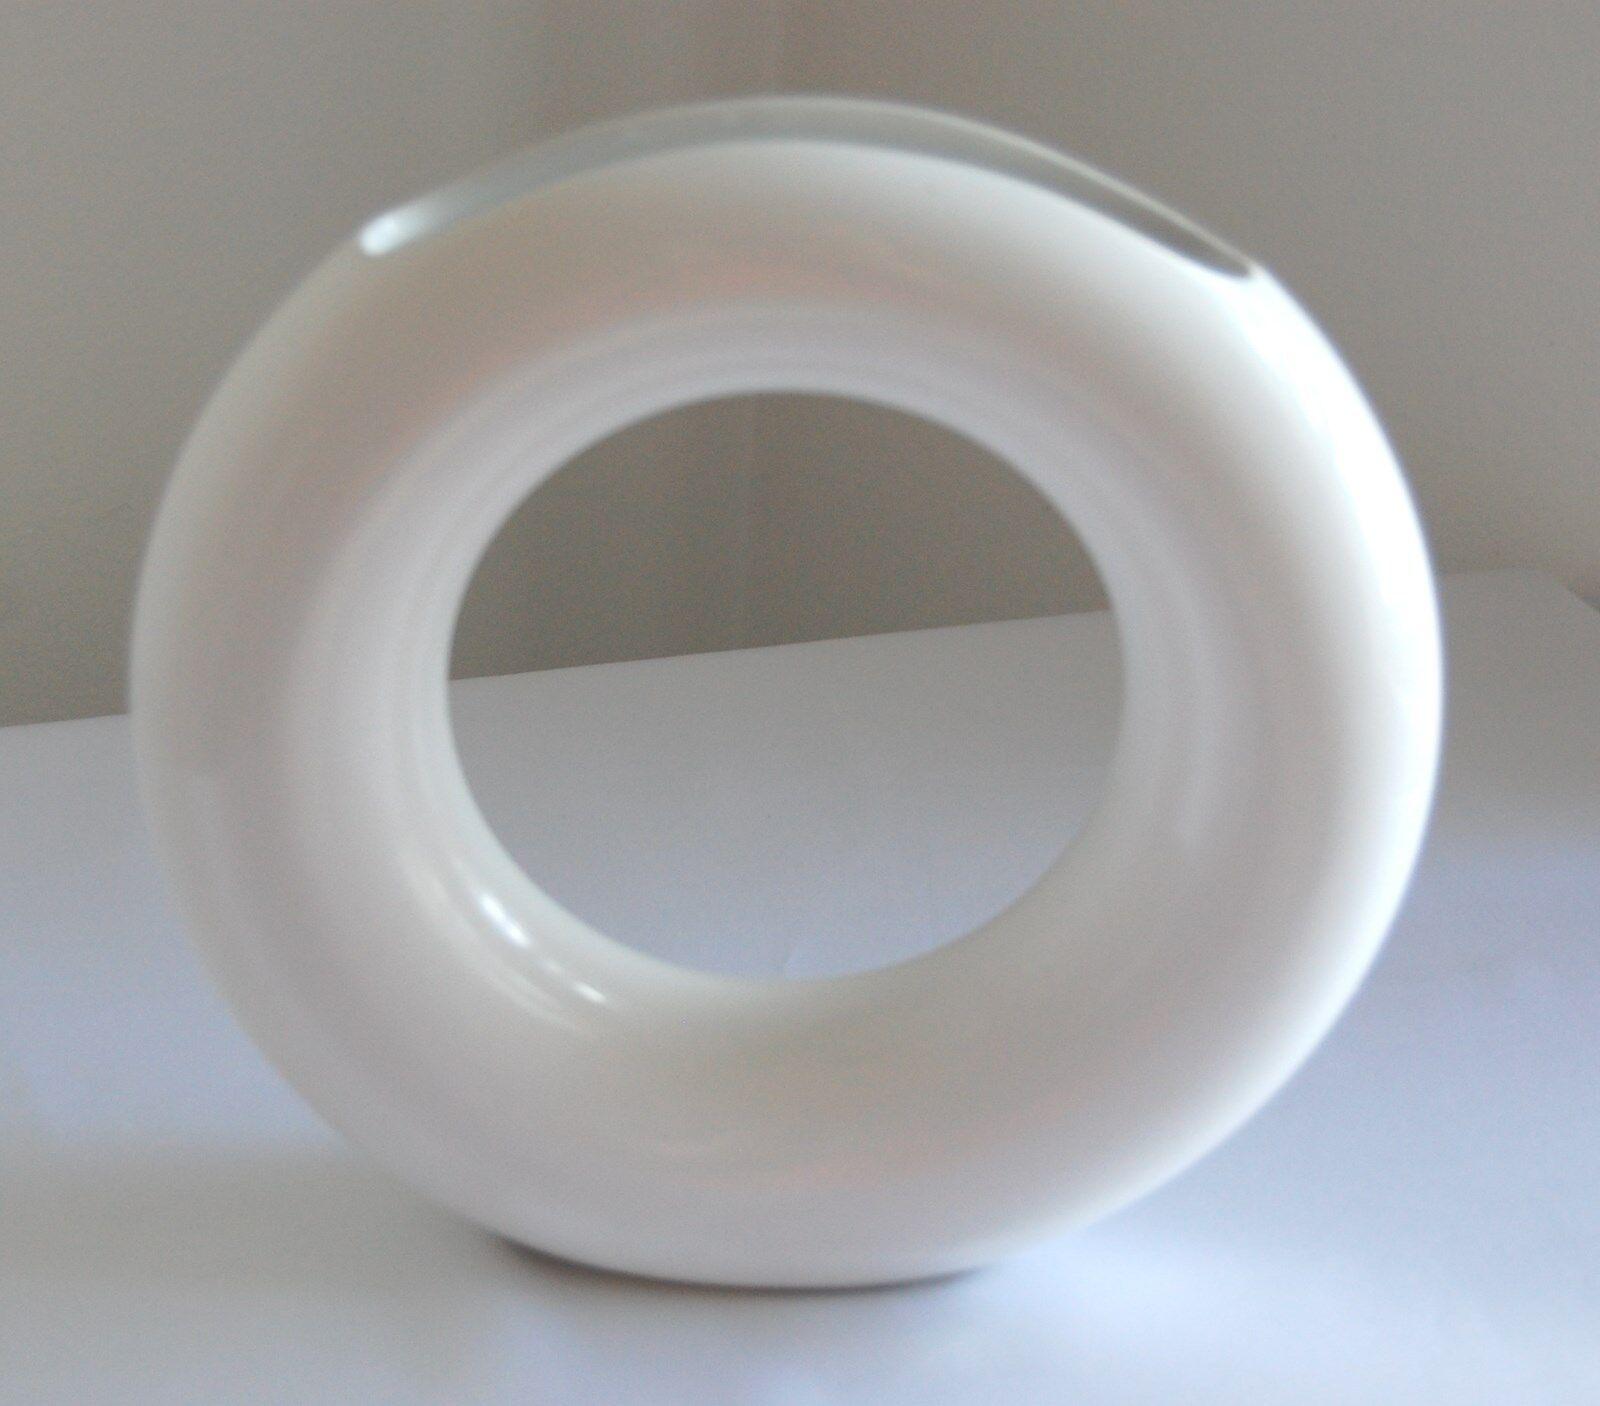 Vintage Mid-Century Modern Weiß  Freeform  Vase - JaNice Interiors Accessories